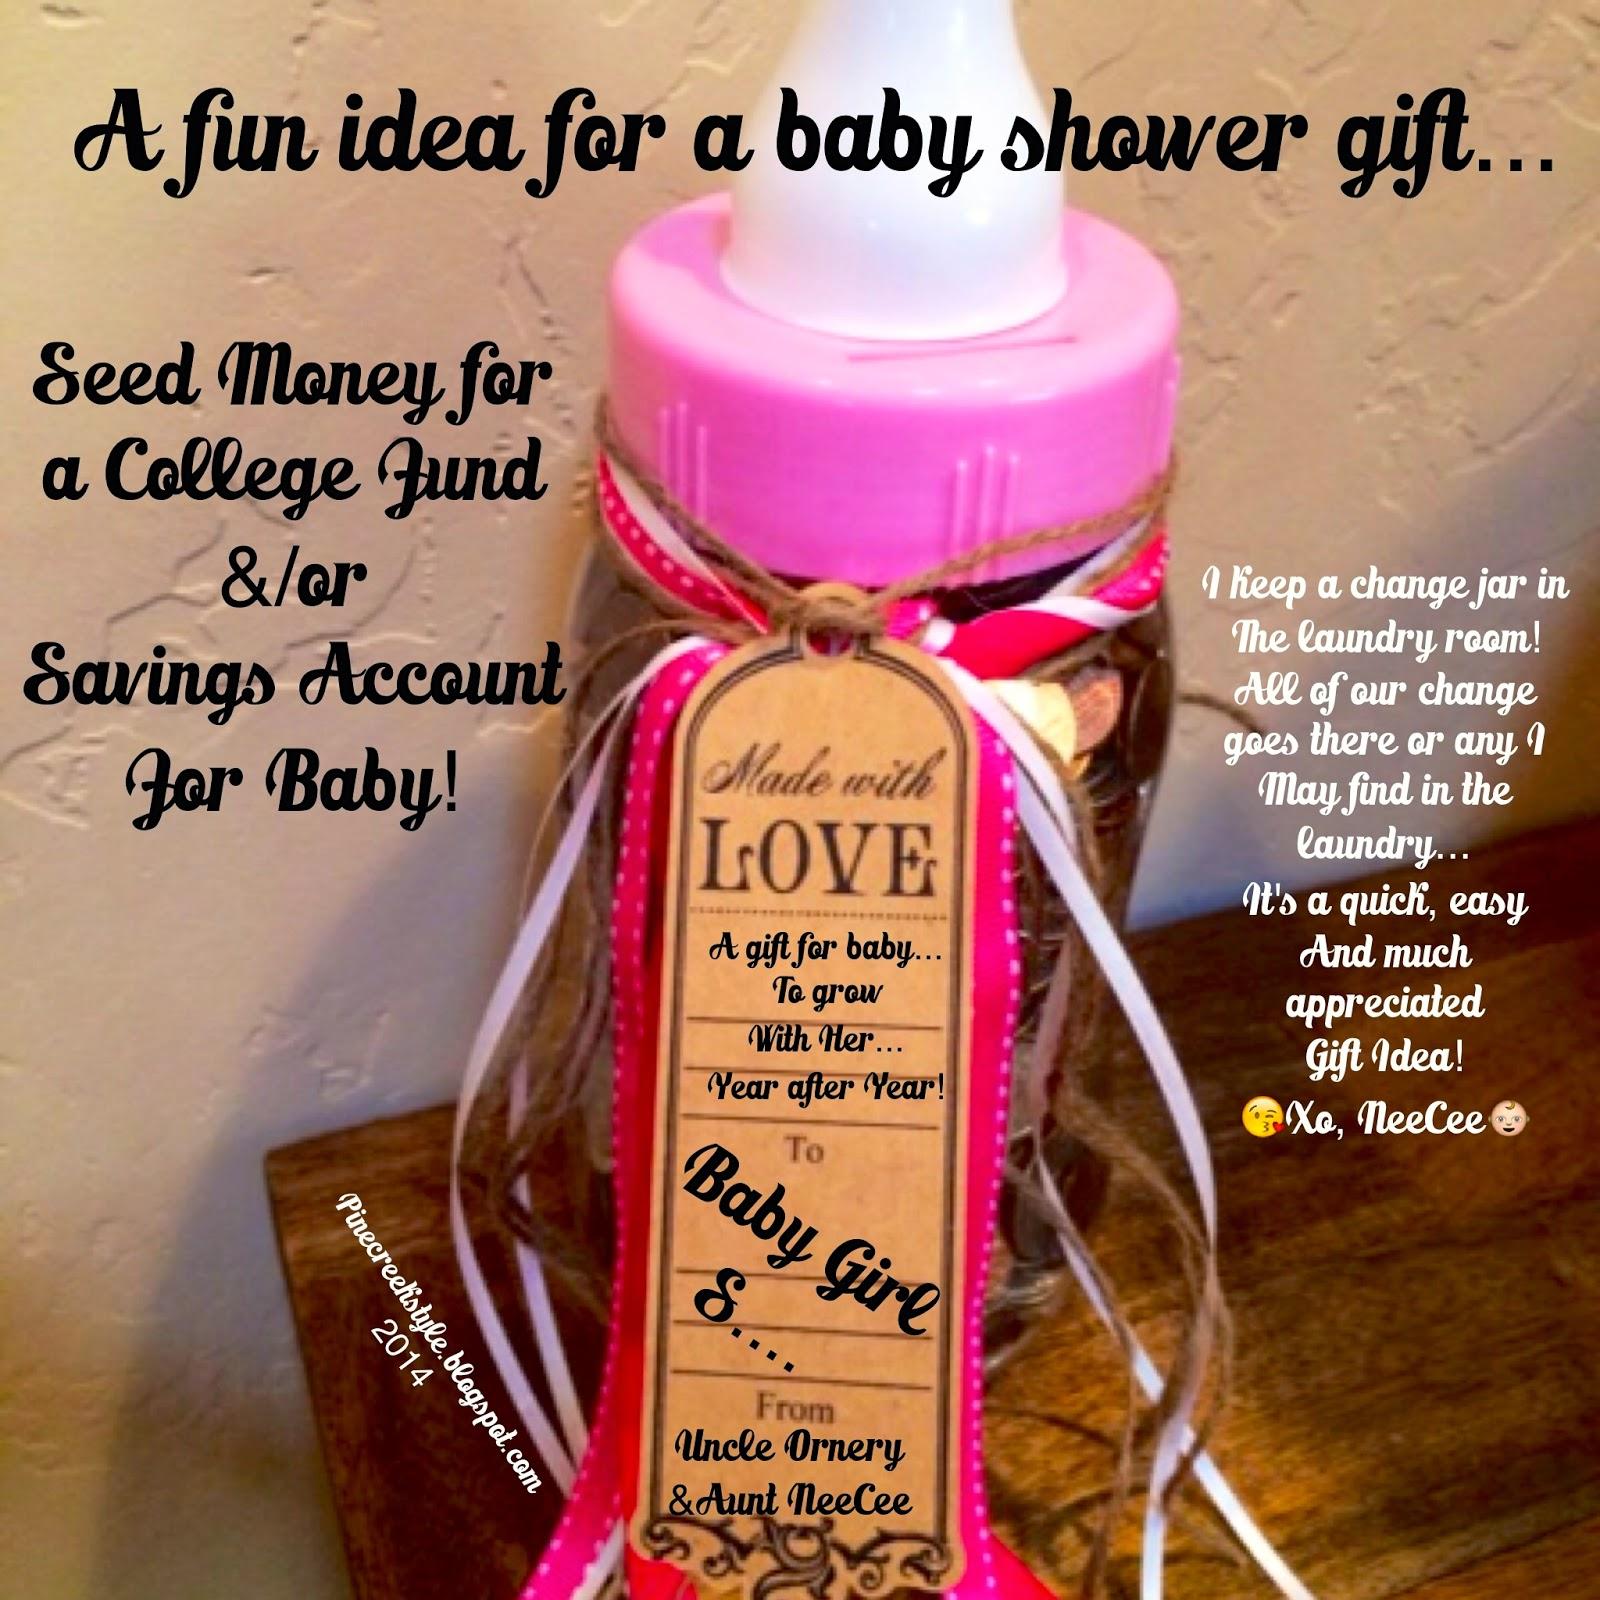 Pine Creek Style Baby Shower Gift Idea